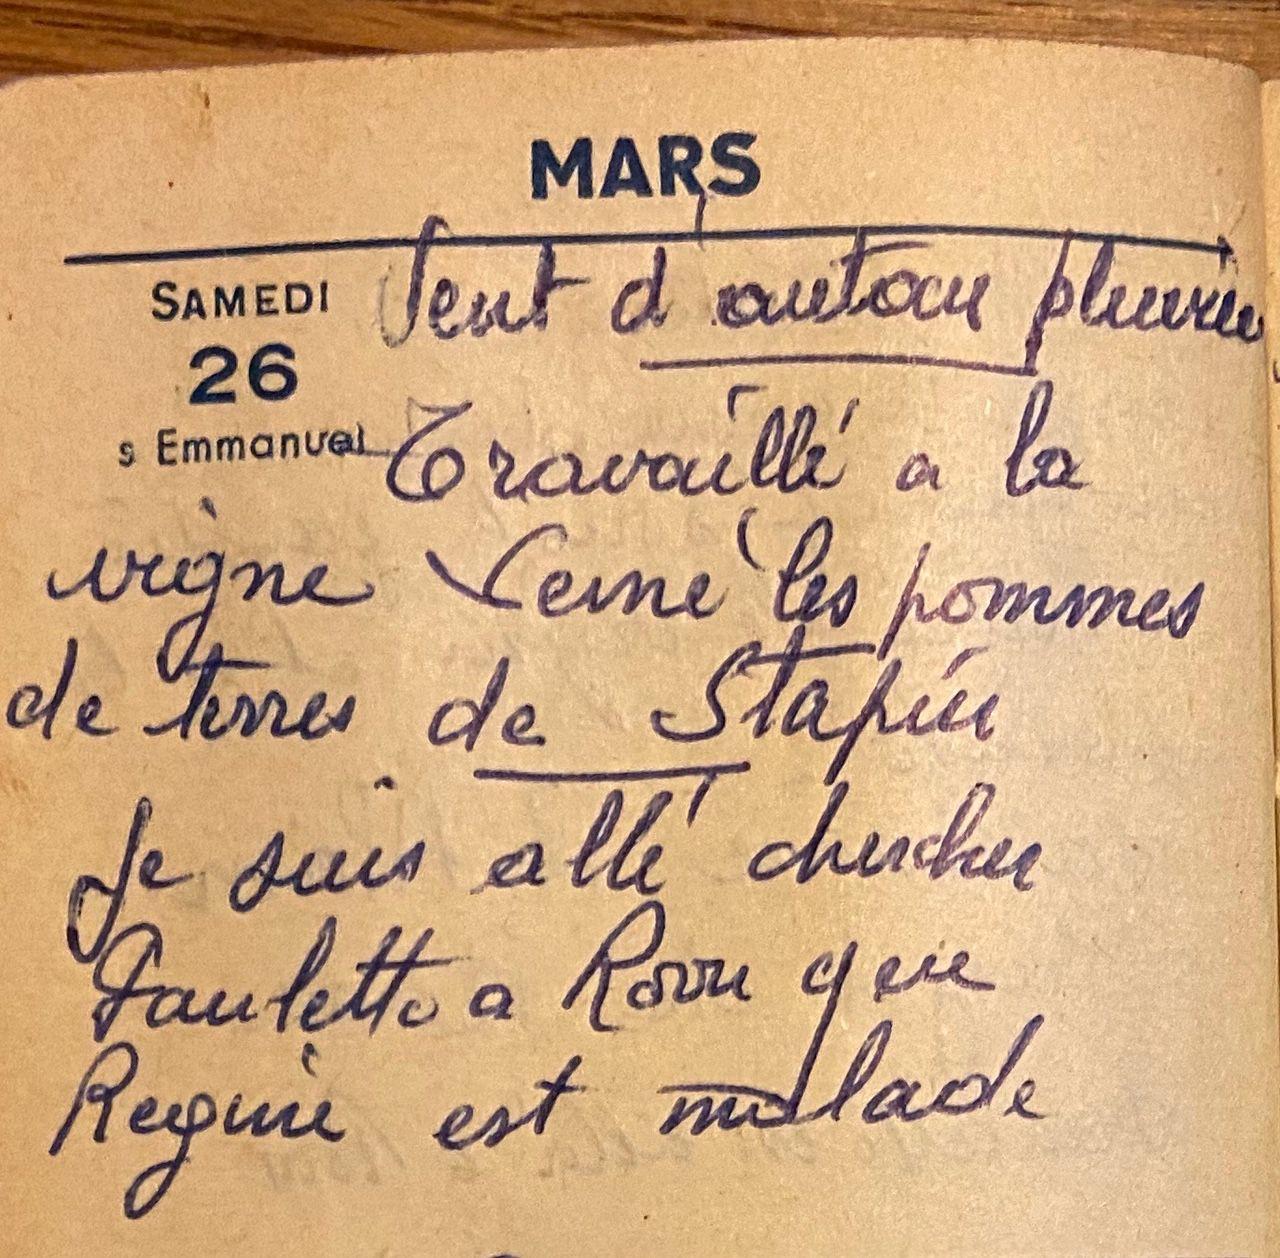 Samedi 26 mars 1960 - Les pommes de terre de Stapin